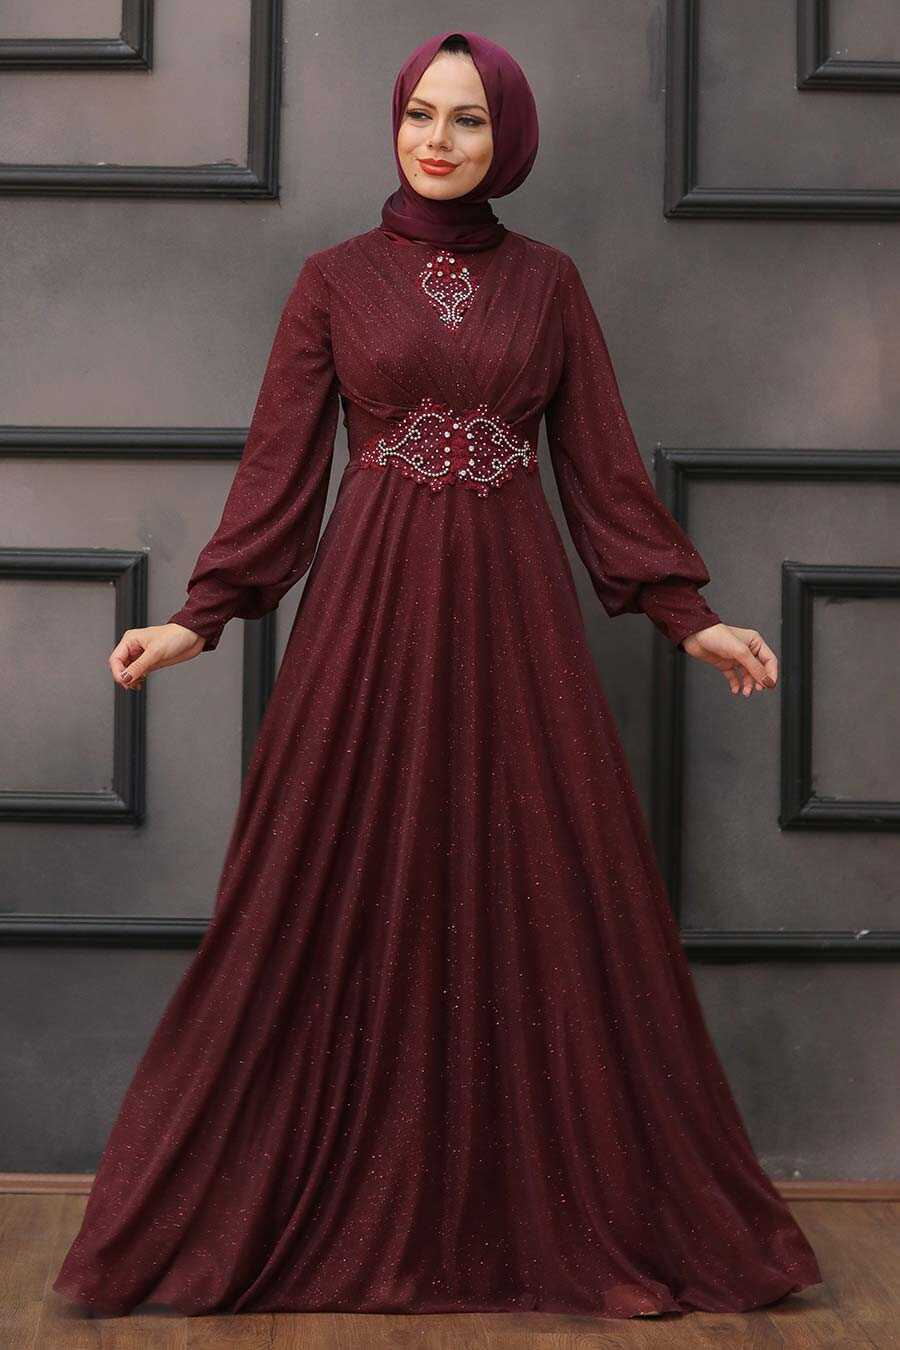 Claret Red Hijab Evening Dress 50151BR